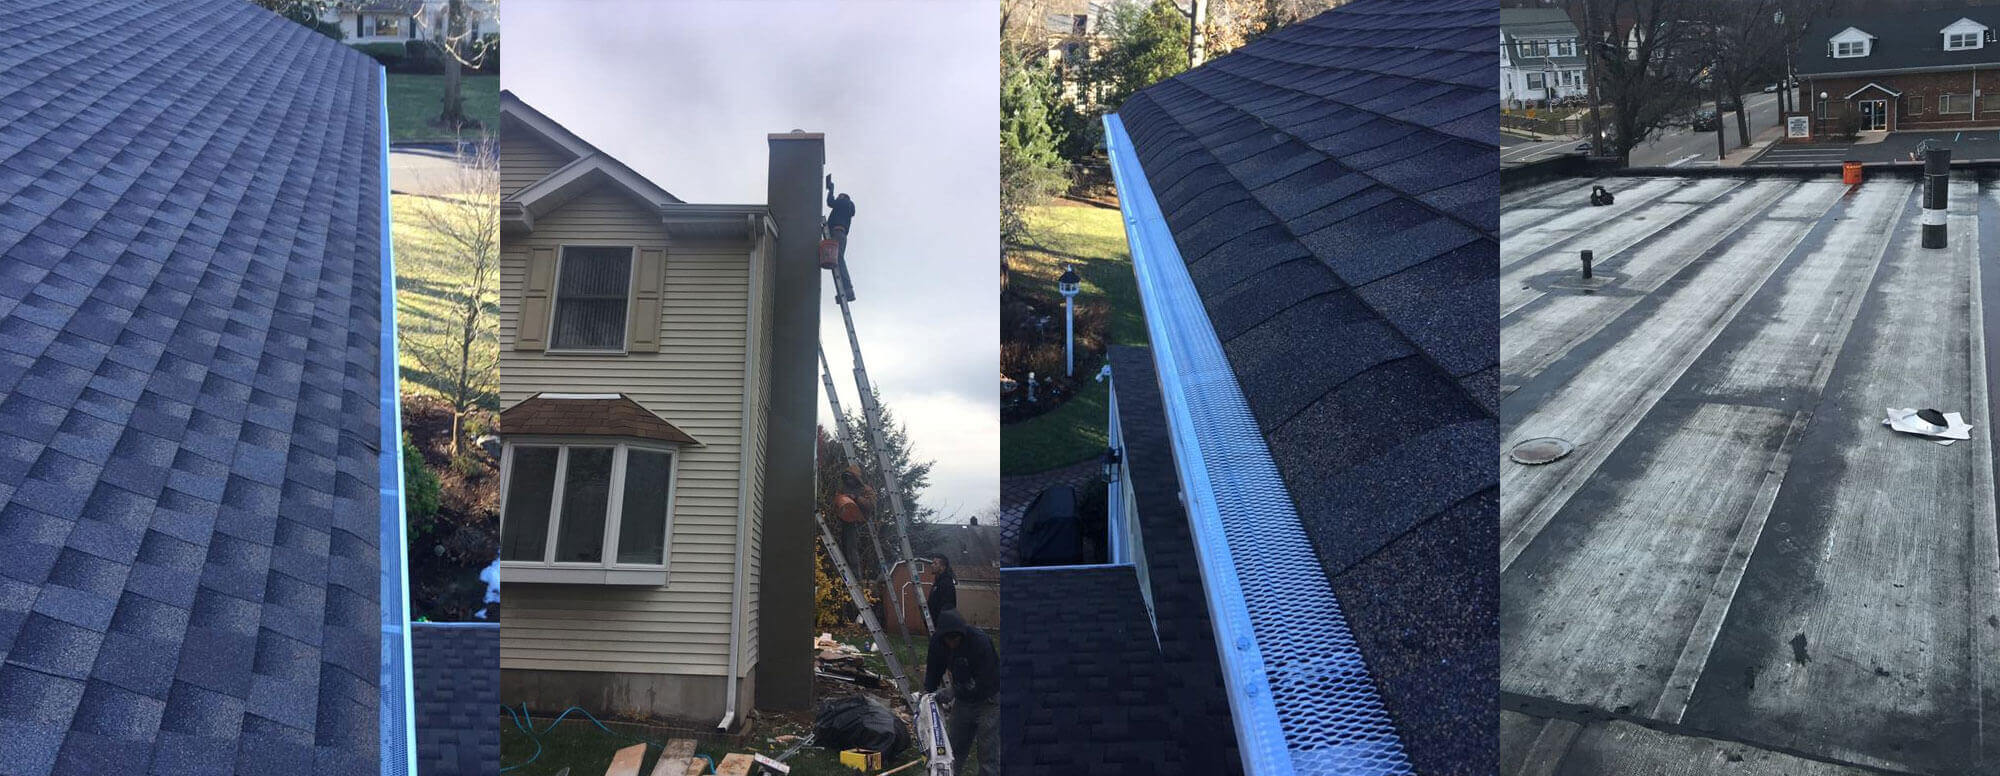 New Jersey Roof Leak Repair Specialist Roof Repair Nj